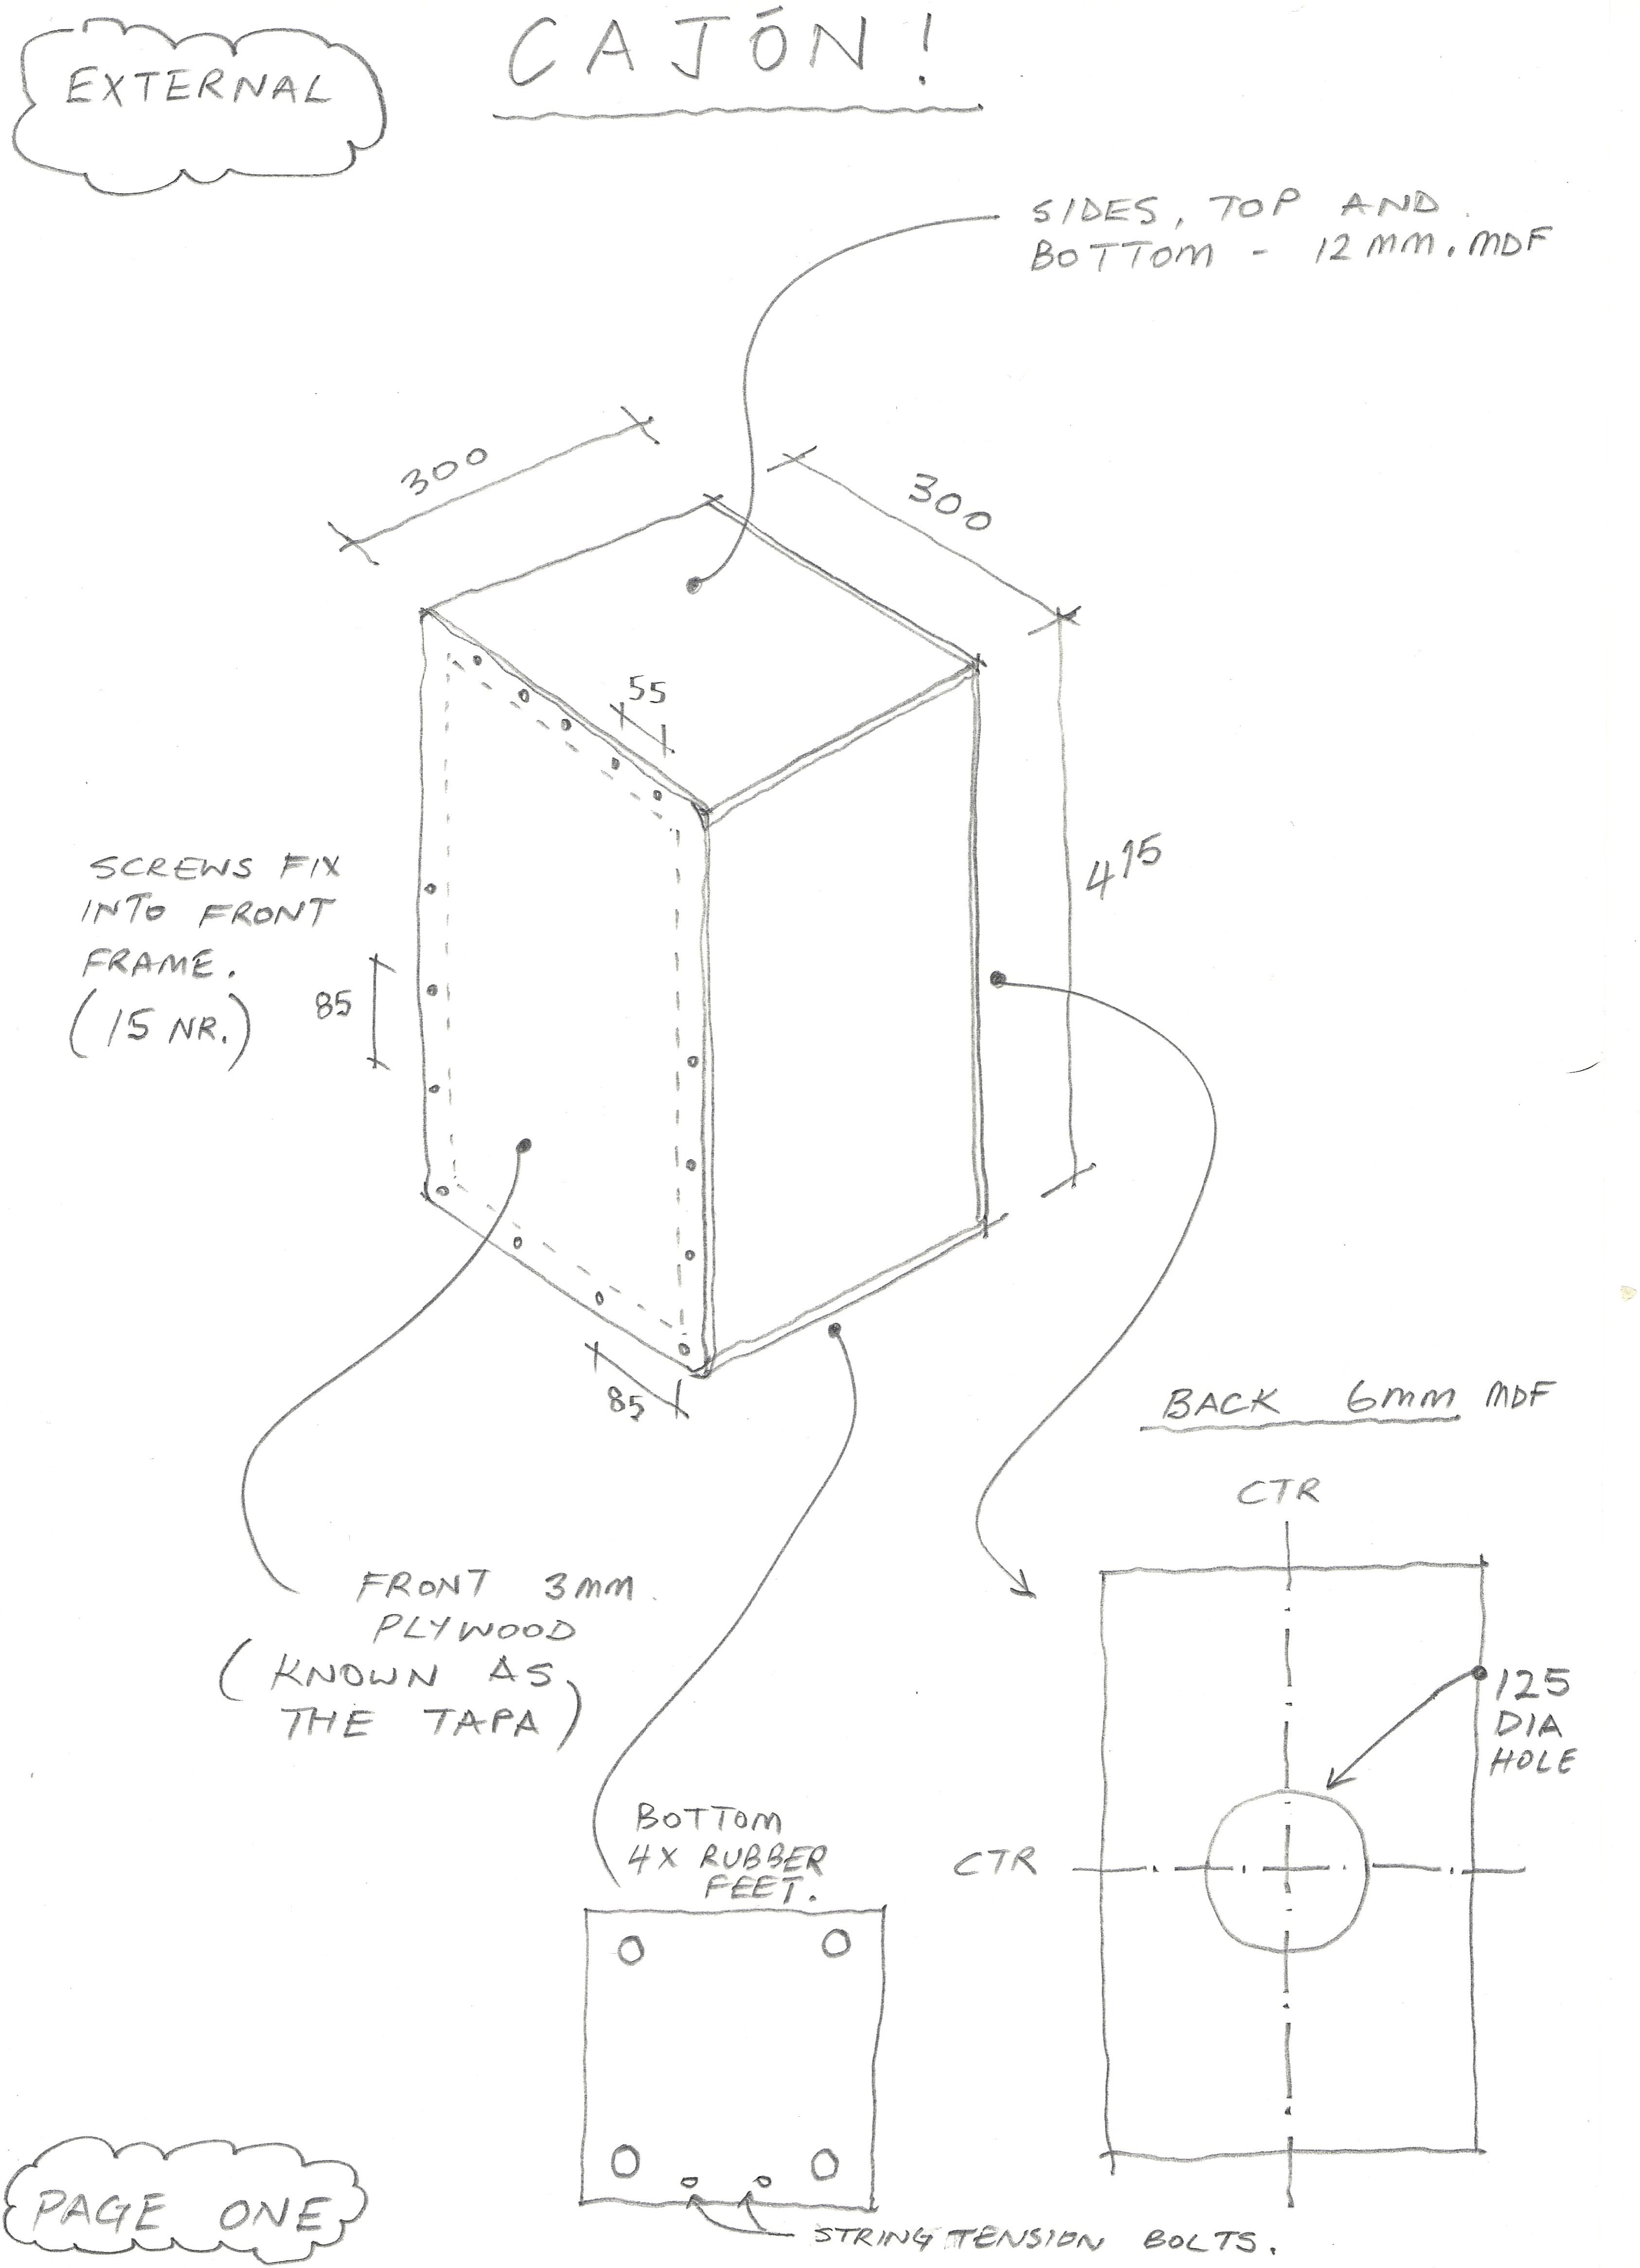 handmade cajon diagram